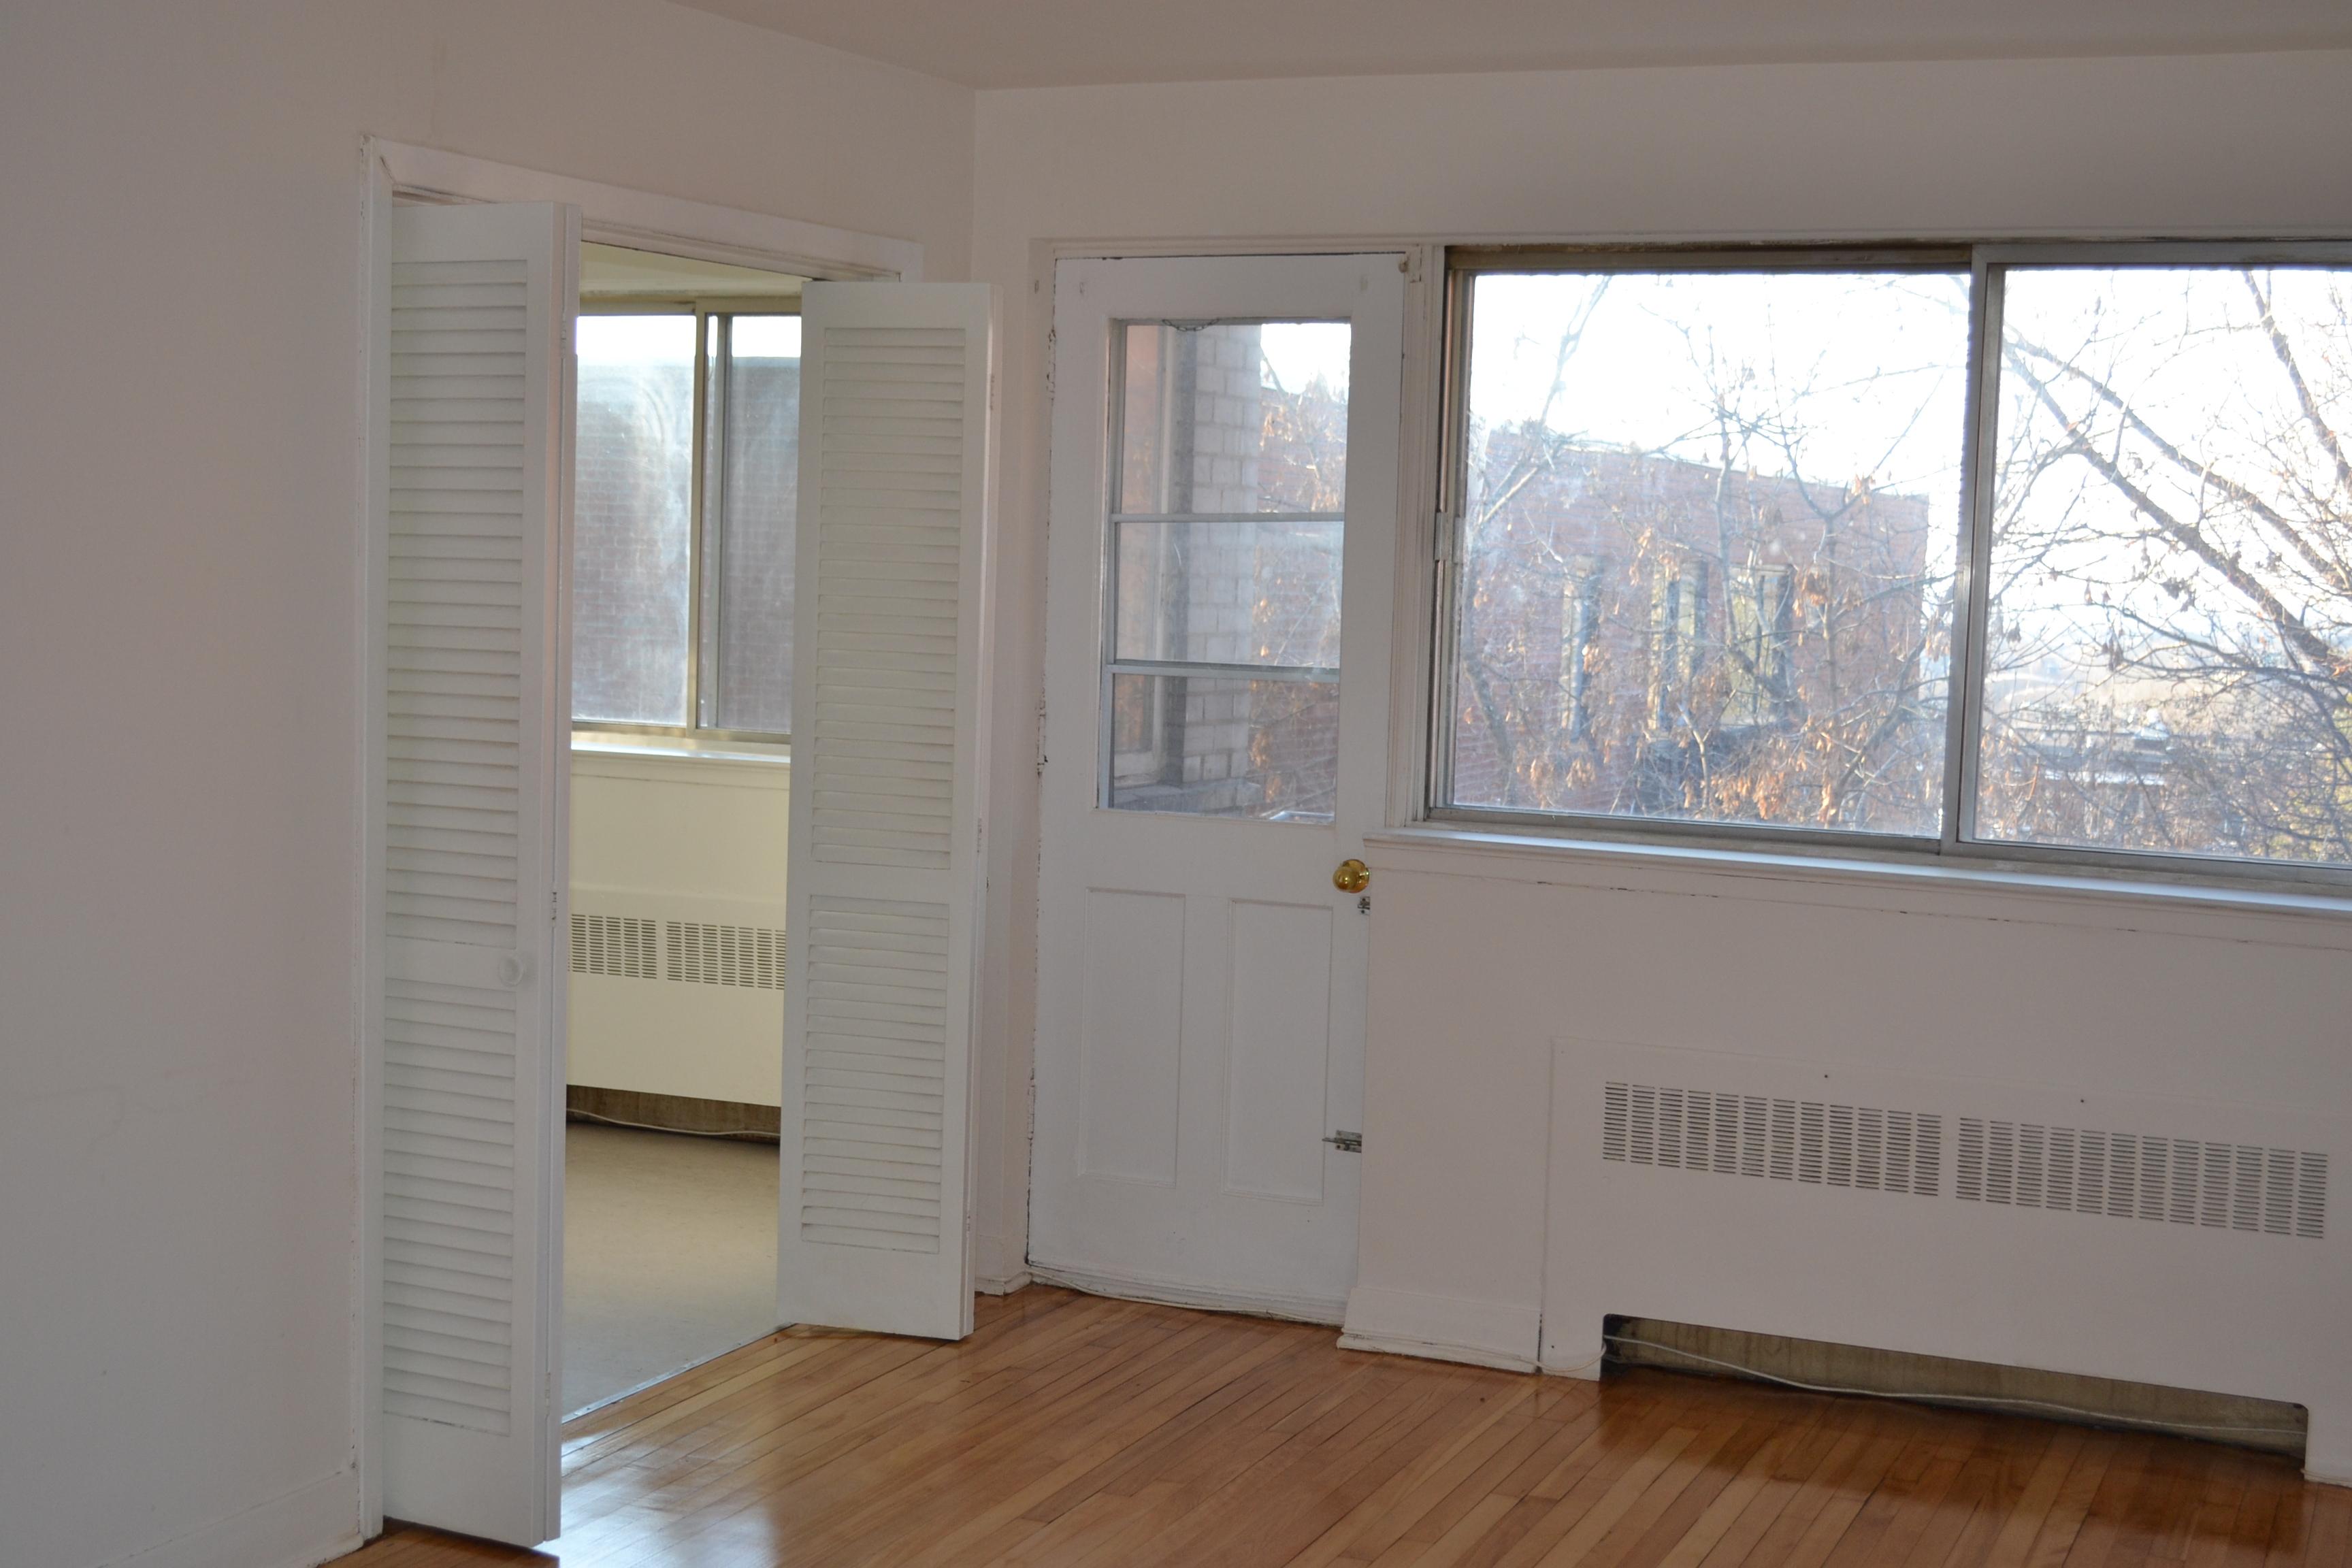 1 bedroom Apartments for rent in Cote-des-Neiges at 2615-2625 Kent - Photo 01 - RentQuebecApartments – L20719